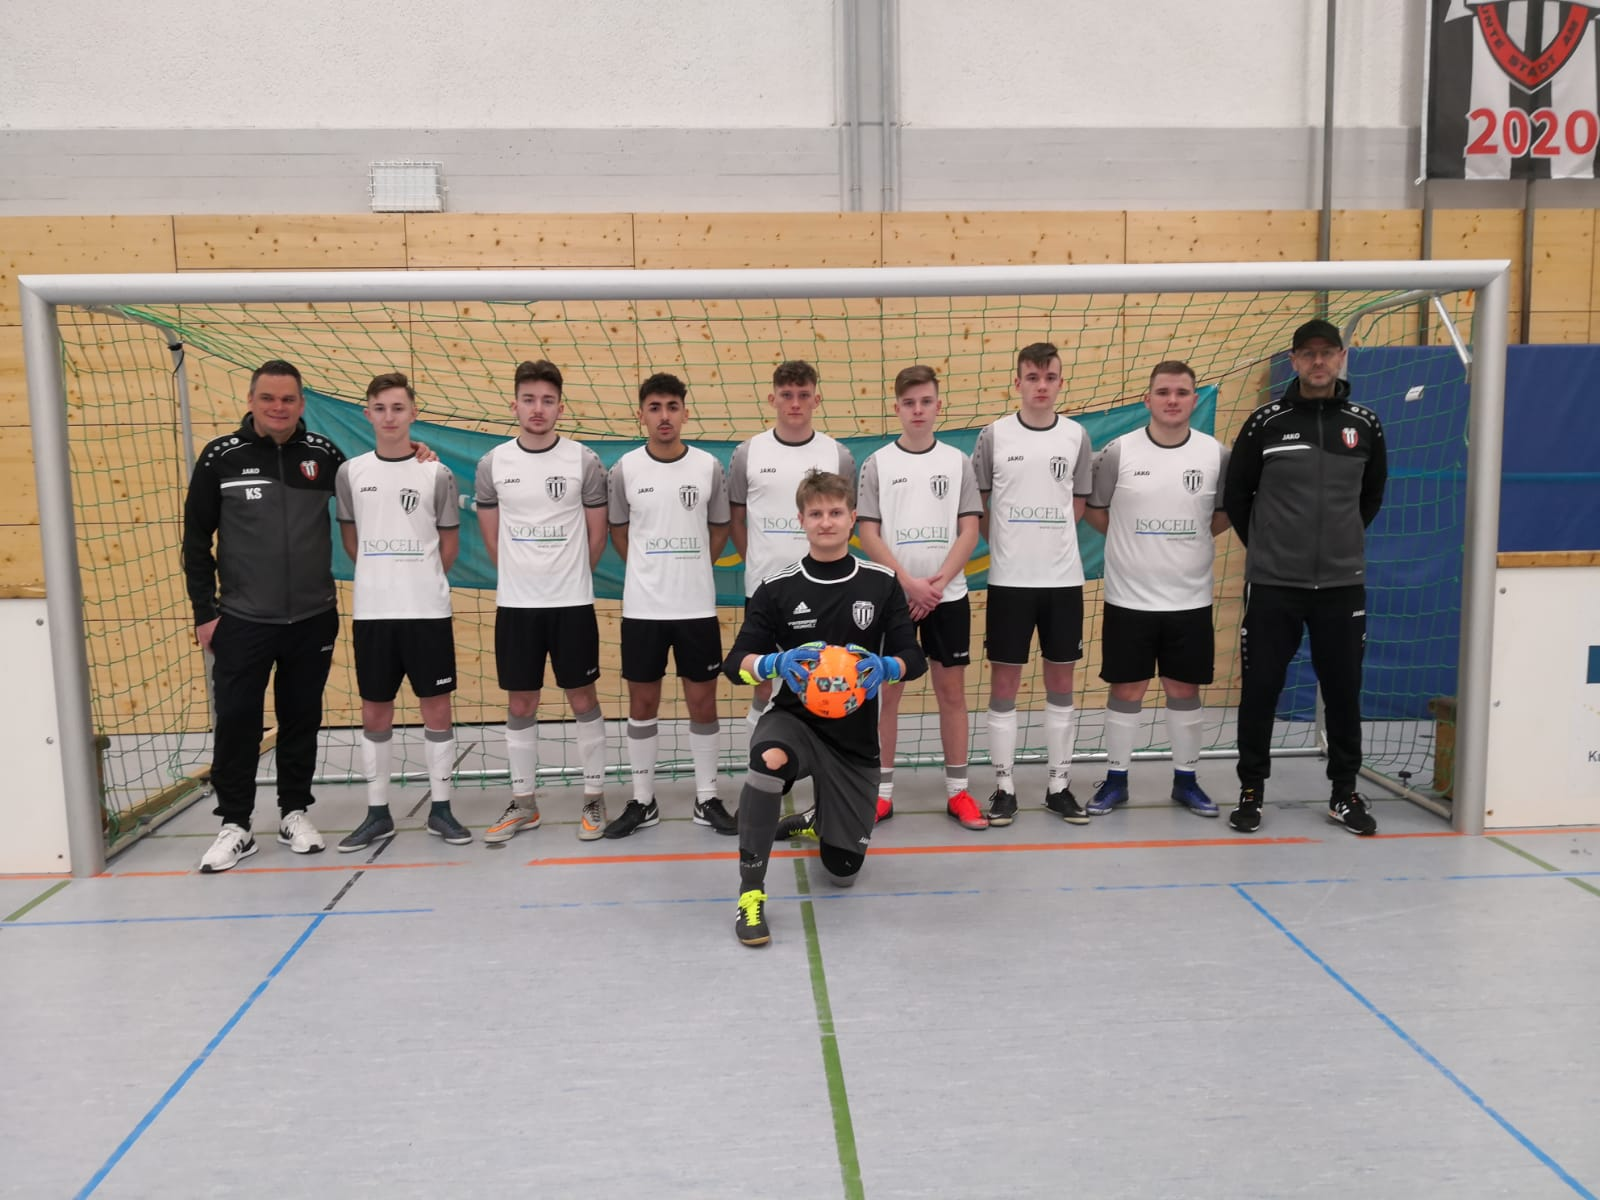 A-Junioren JSG-Linz - Süwag Hallencup 2020